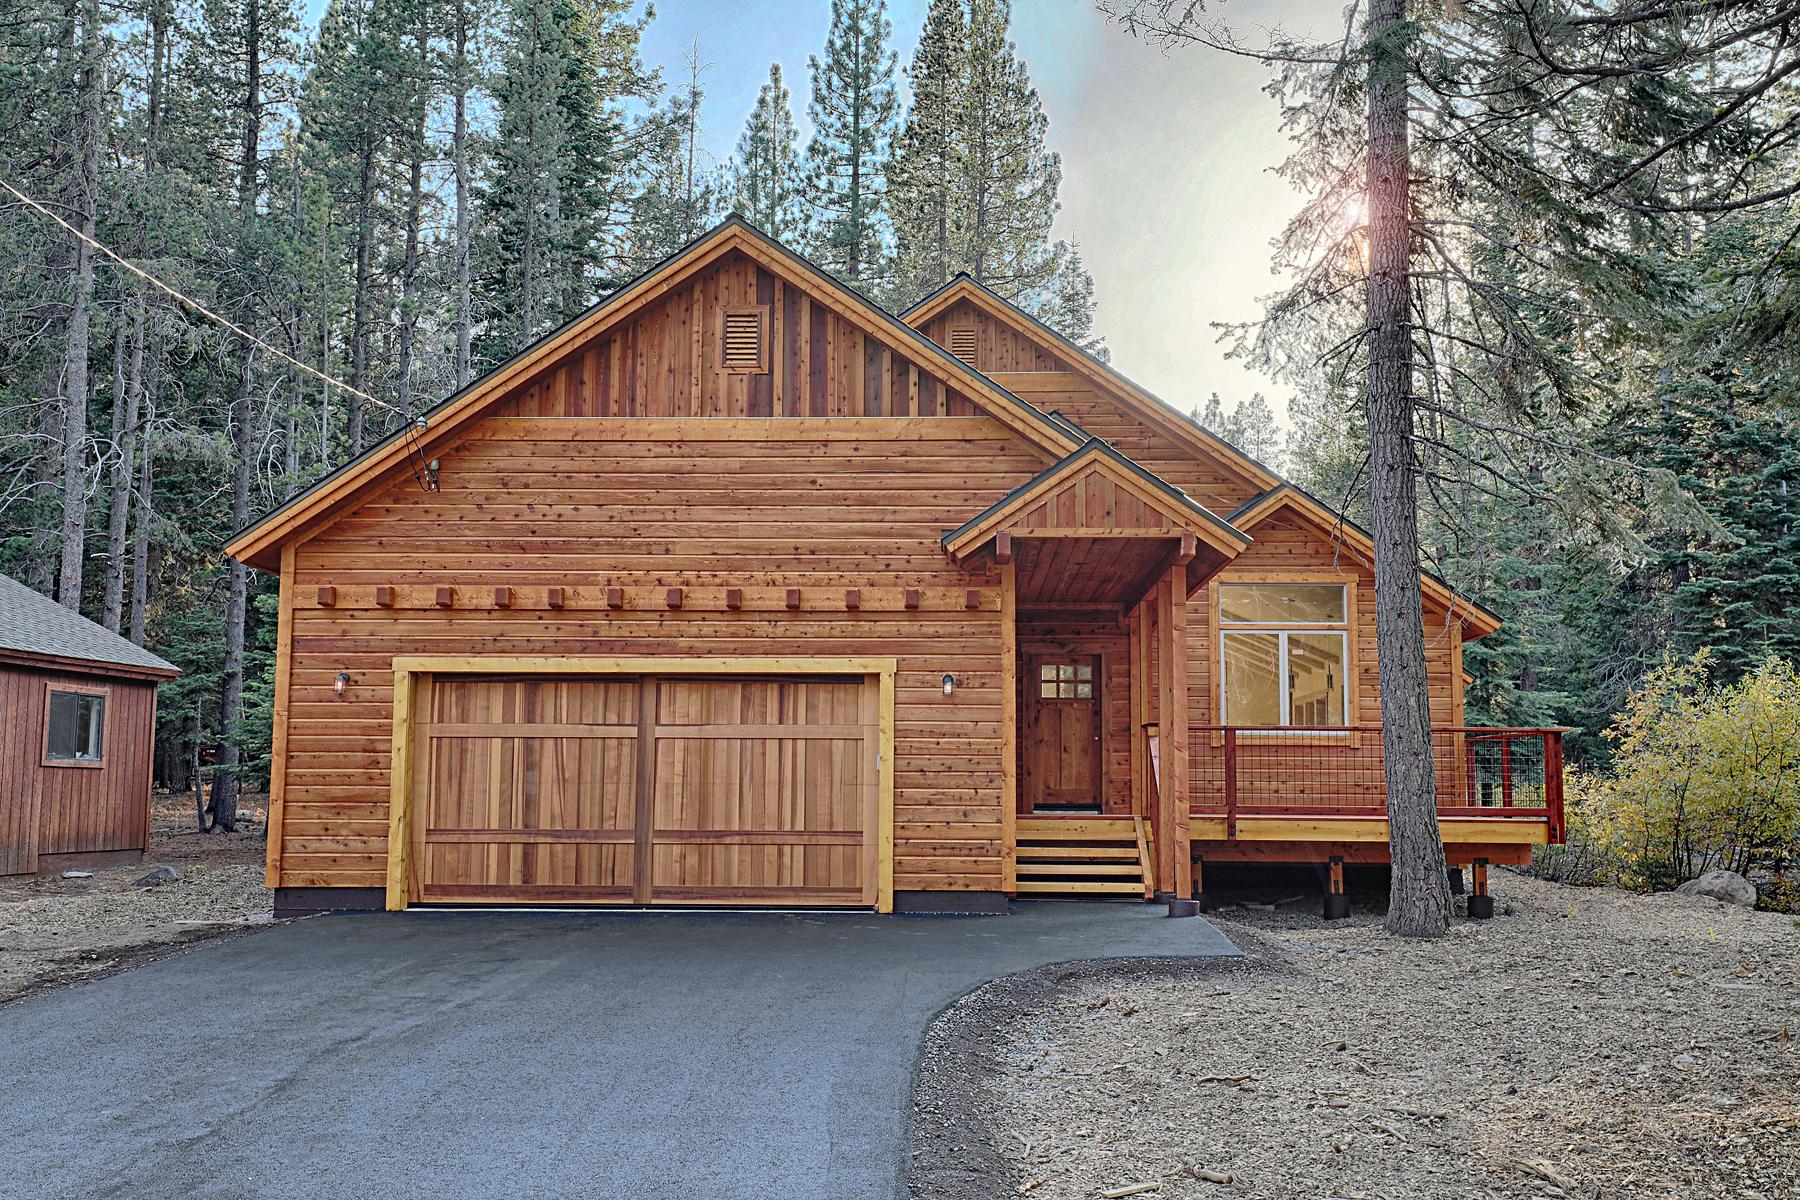 Property 为 销售 在 14141 Tyrol Road, Truckee, CA 14141 Tyrol Road 特拉基, 加利福尼亚州 96161 美国